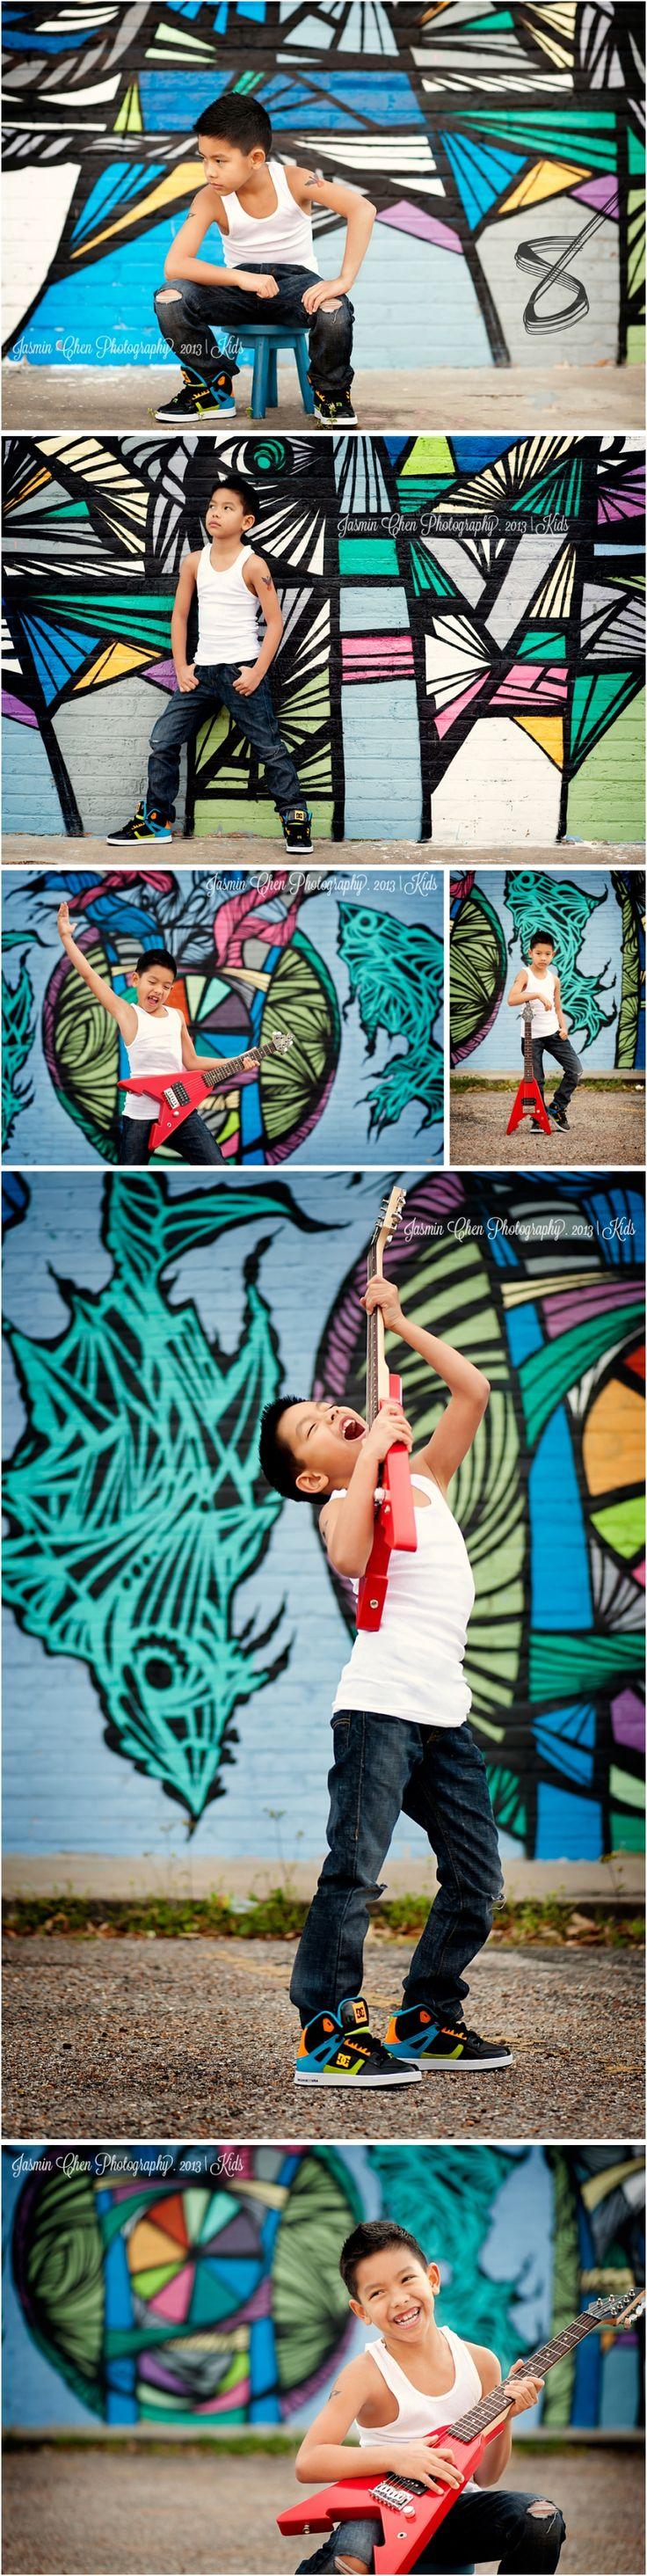 Interactive graffiti wall uk - Jasmin Chen Photography 2013 Houston Tx Life Style Photographer Urban Shoot